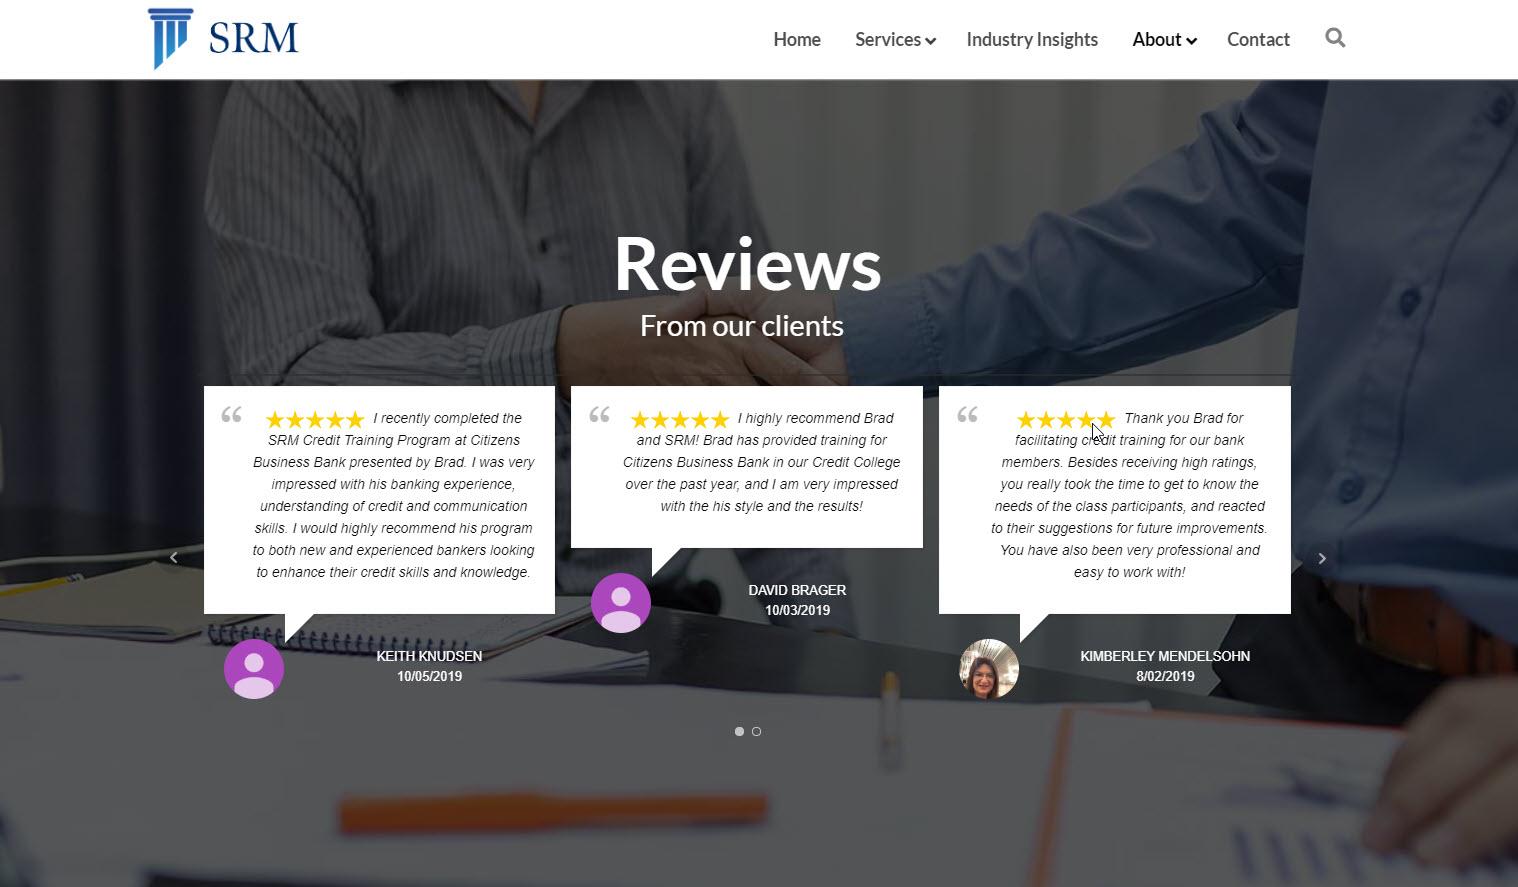 SRM reviews page